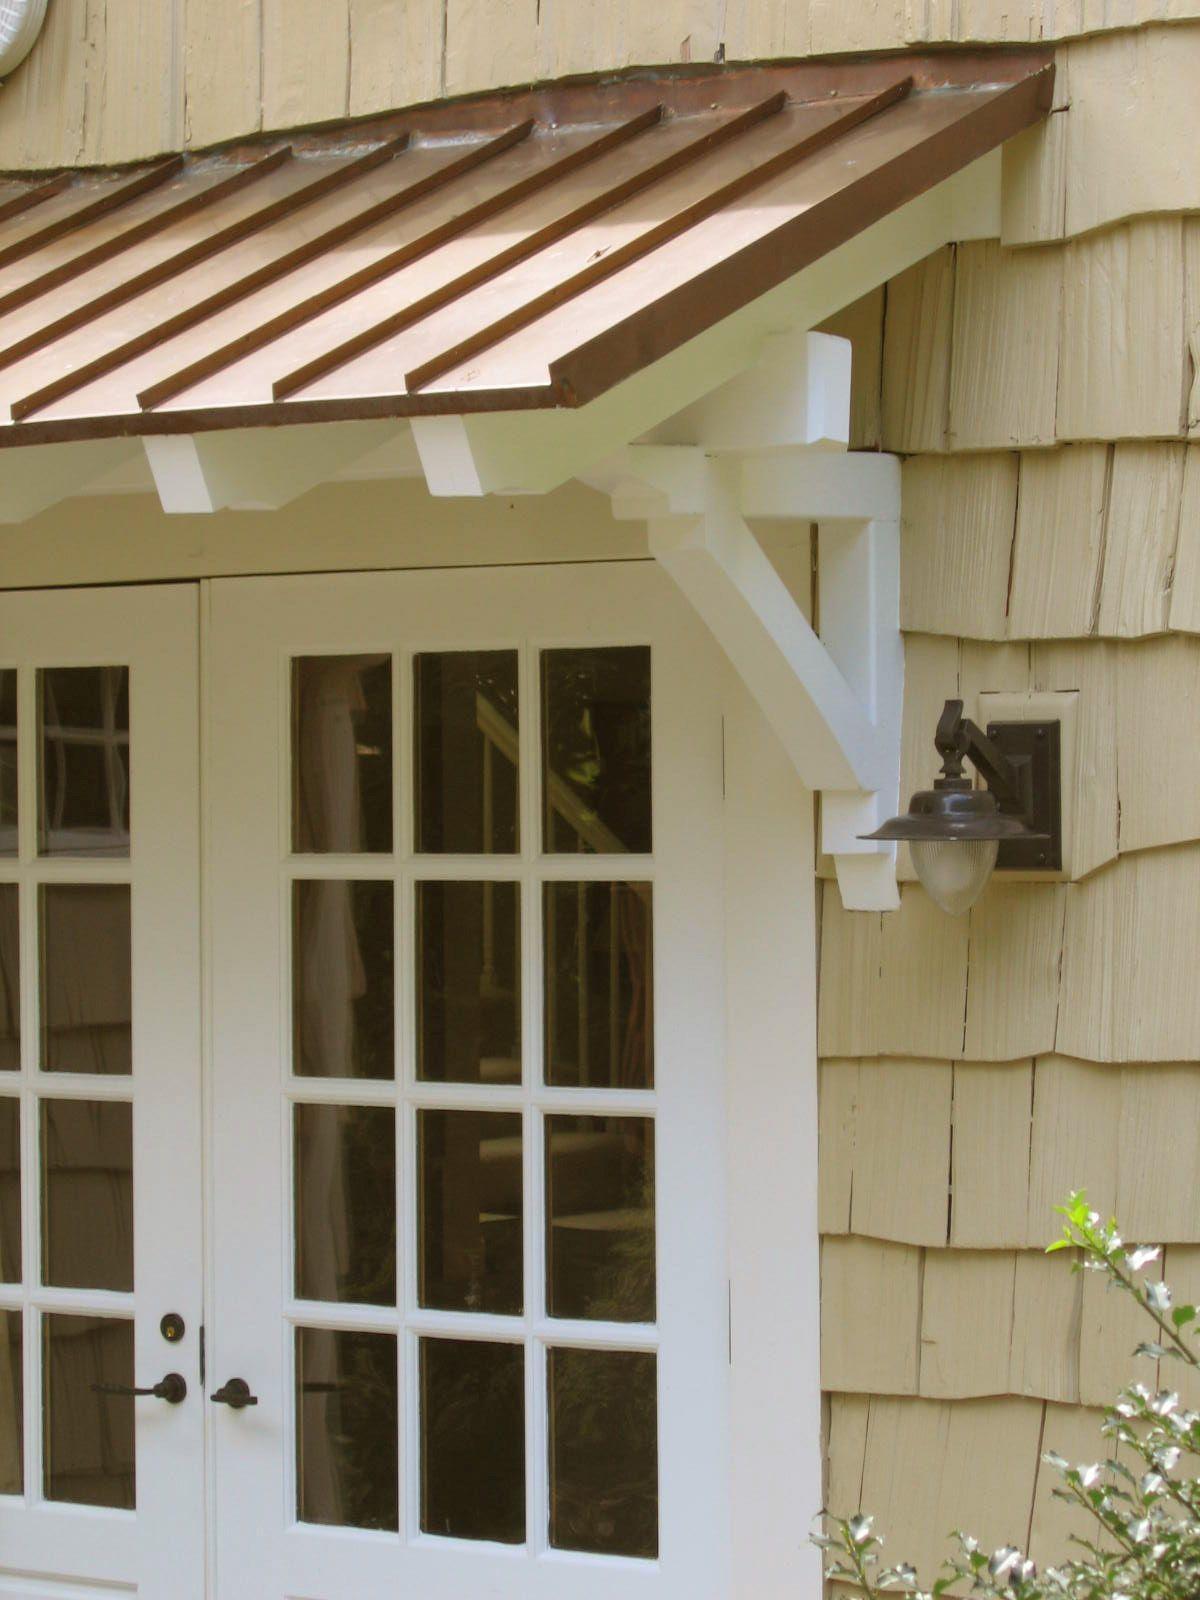 Best 25 Roof brackets ideas on Pinterest Portico entry